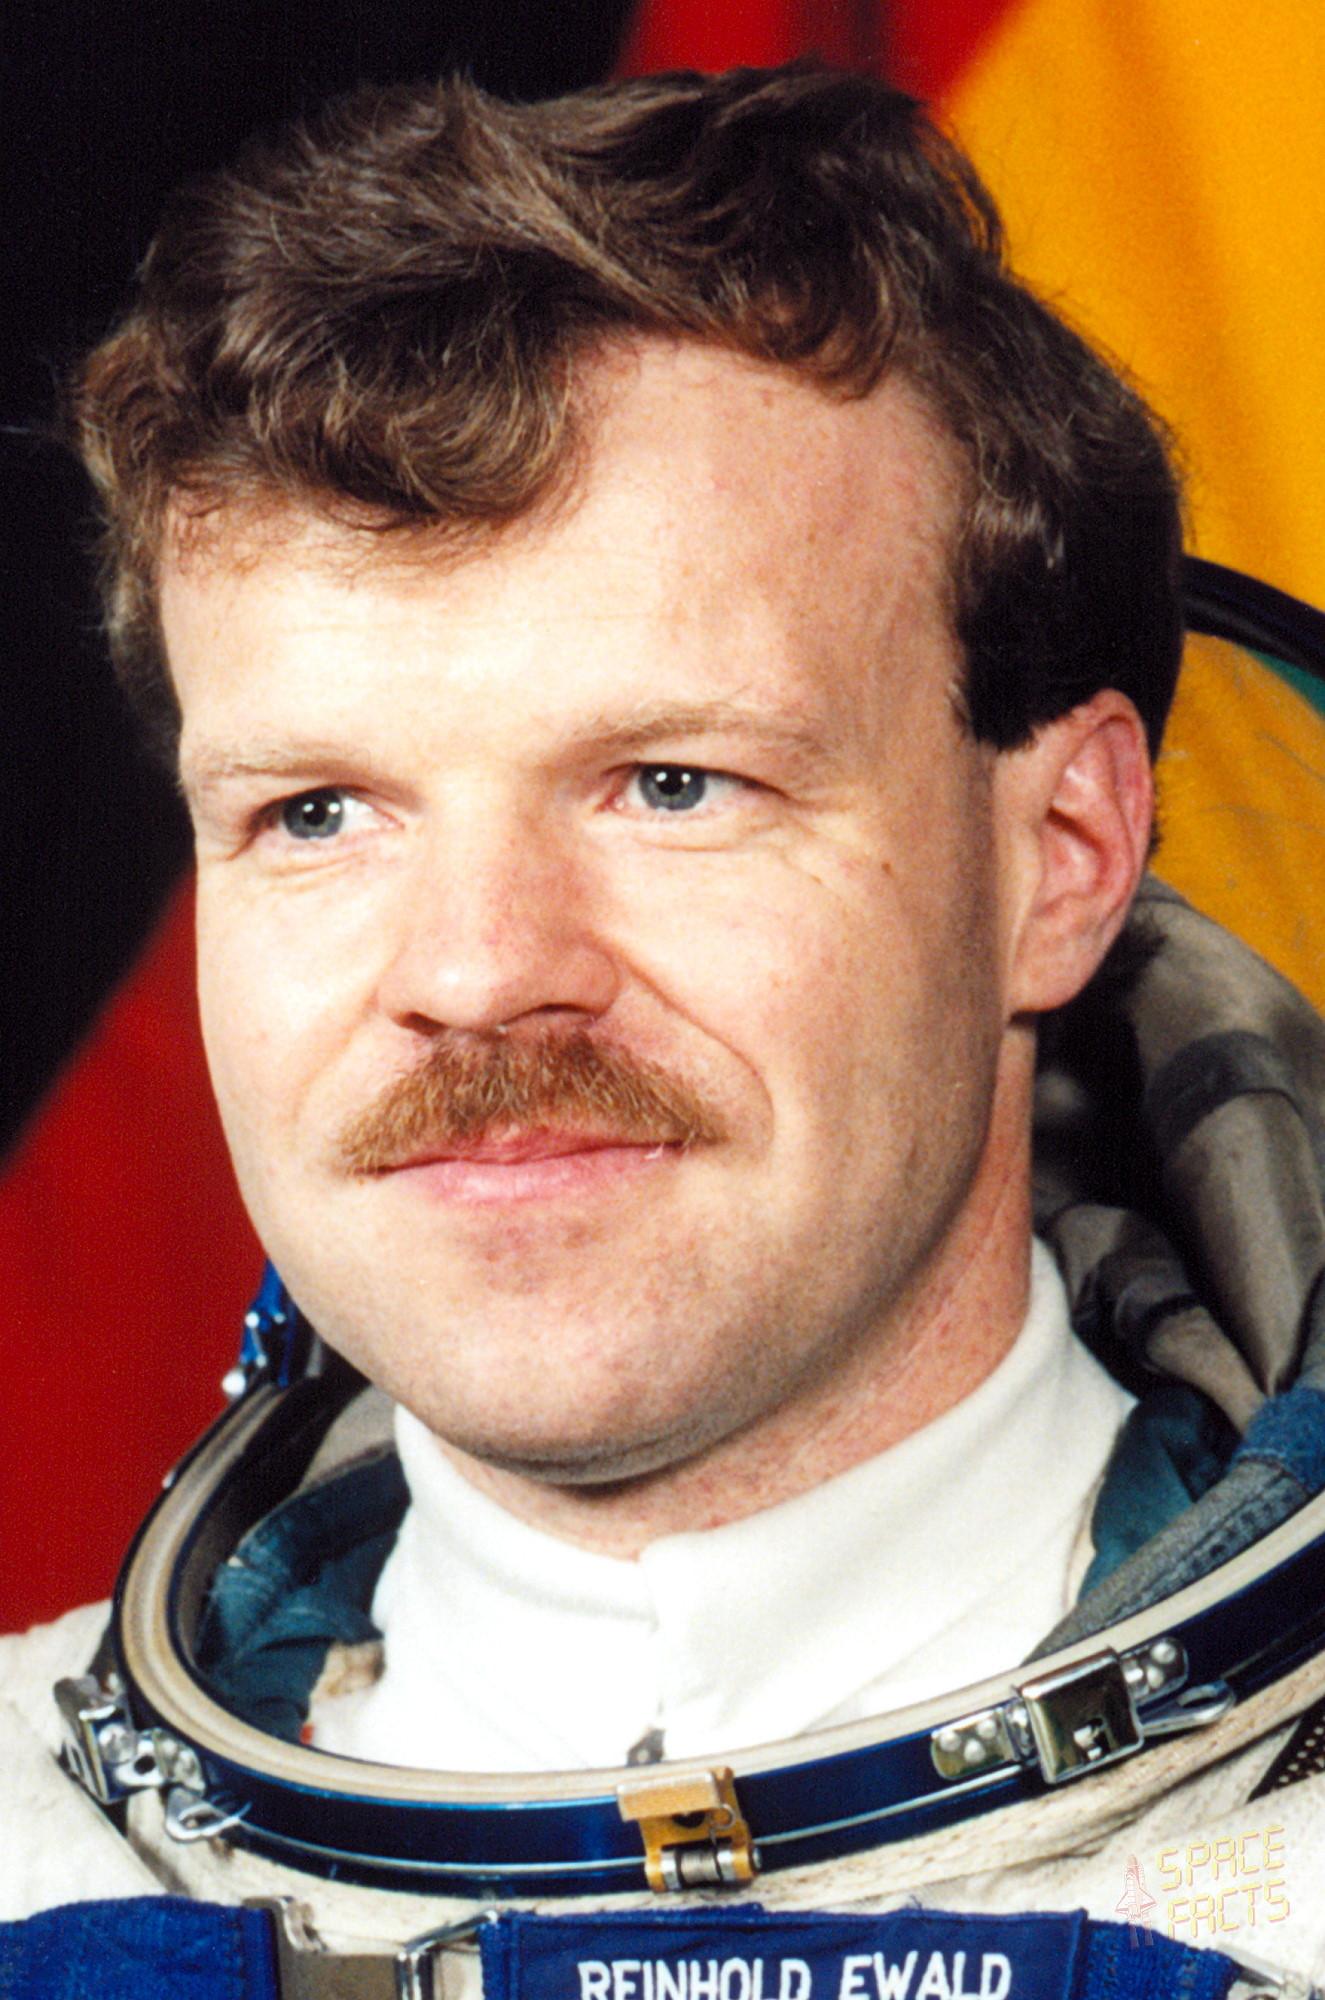 Cosmonaut Biography Reinhold Ewald